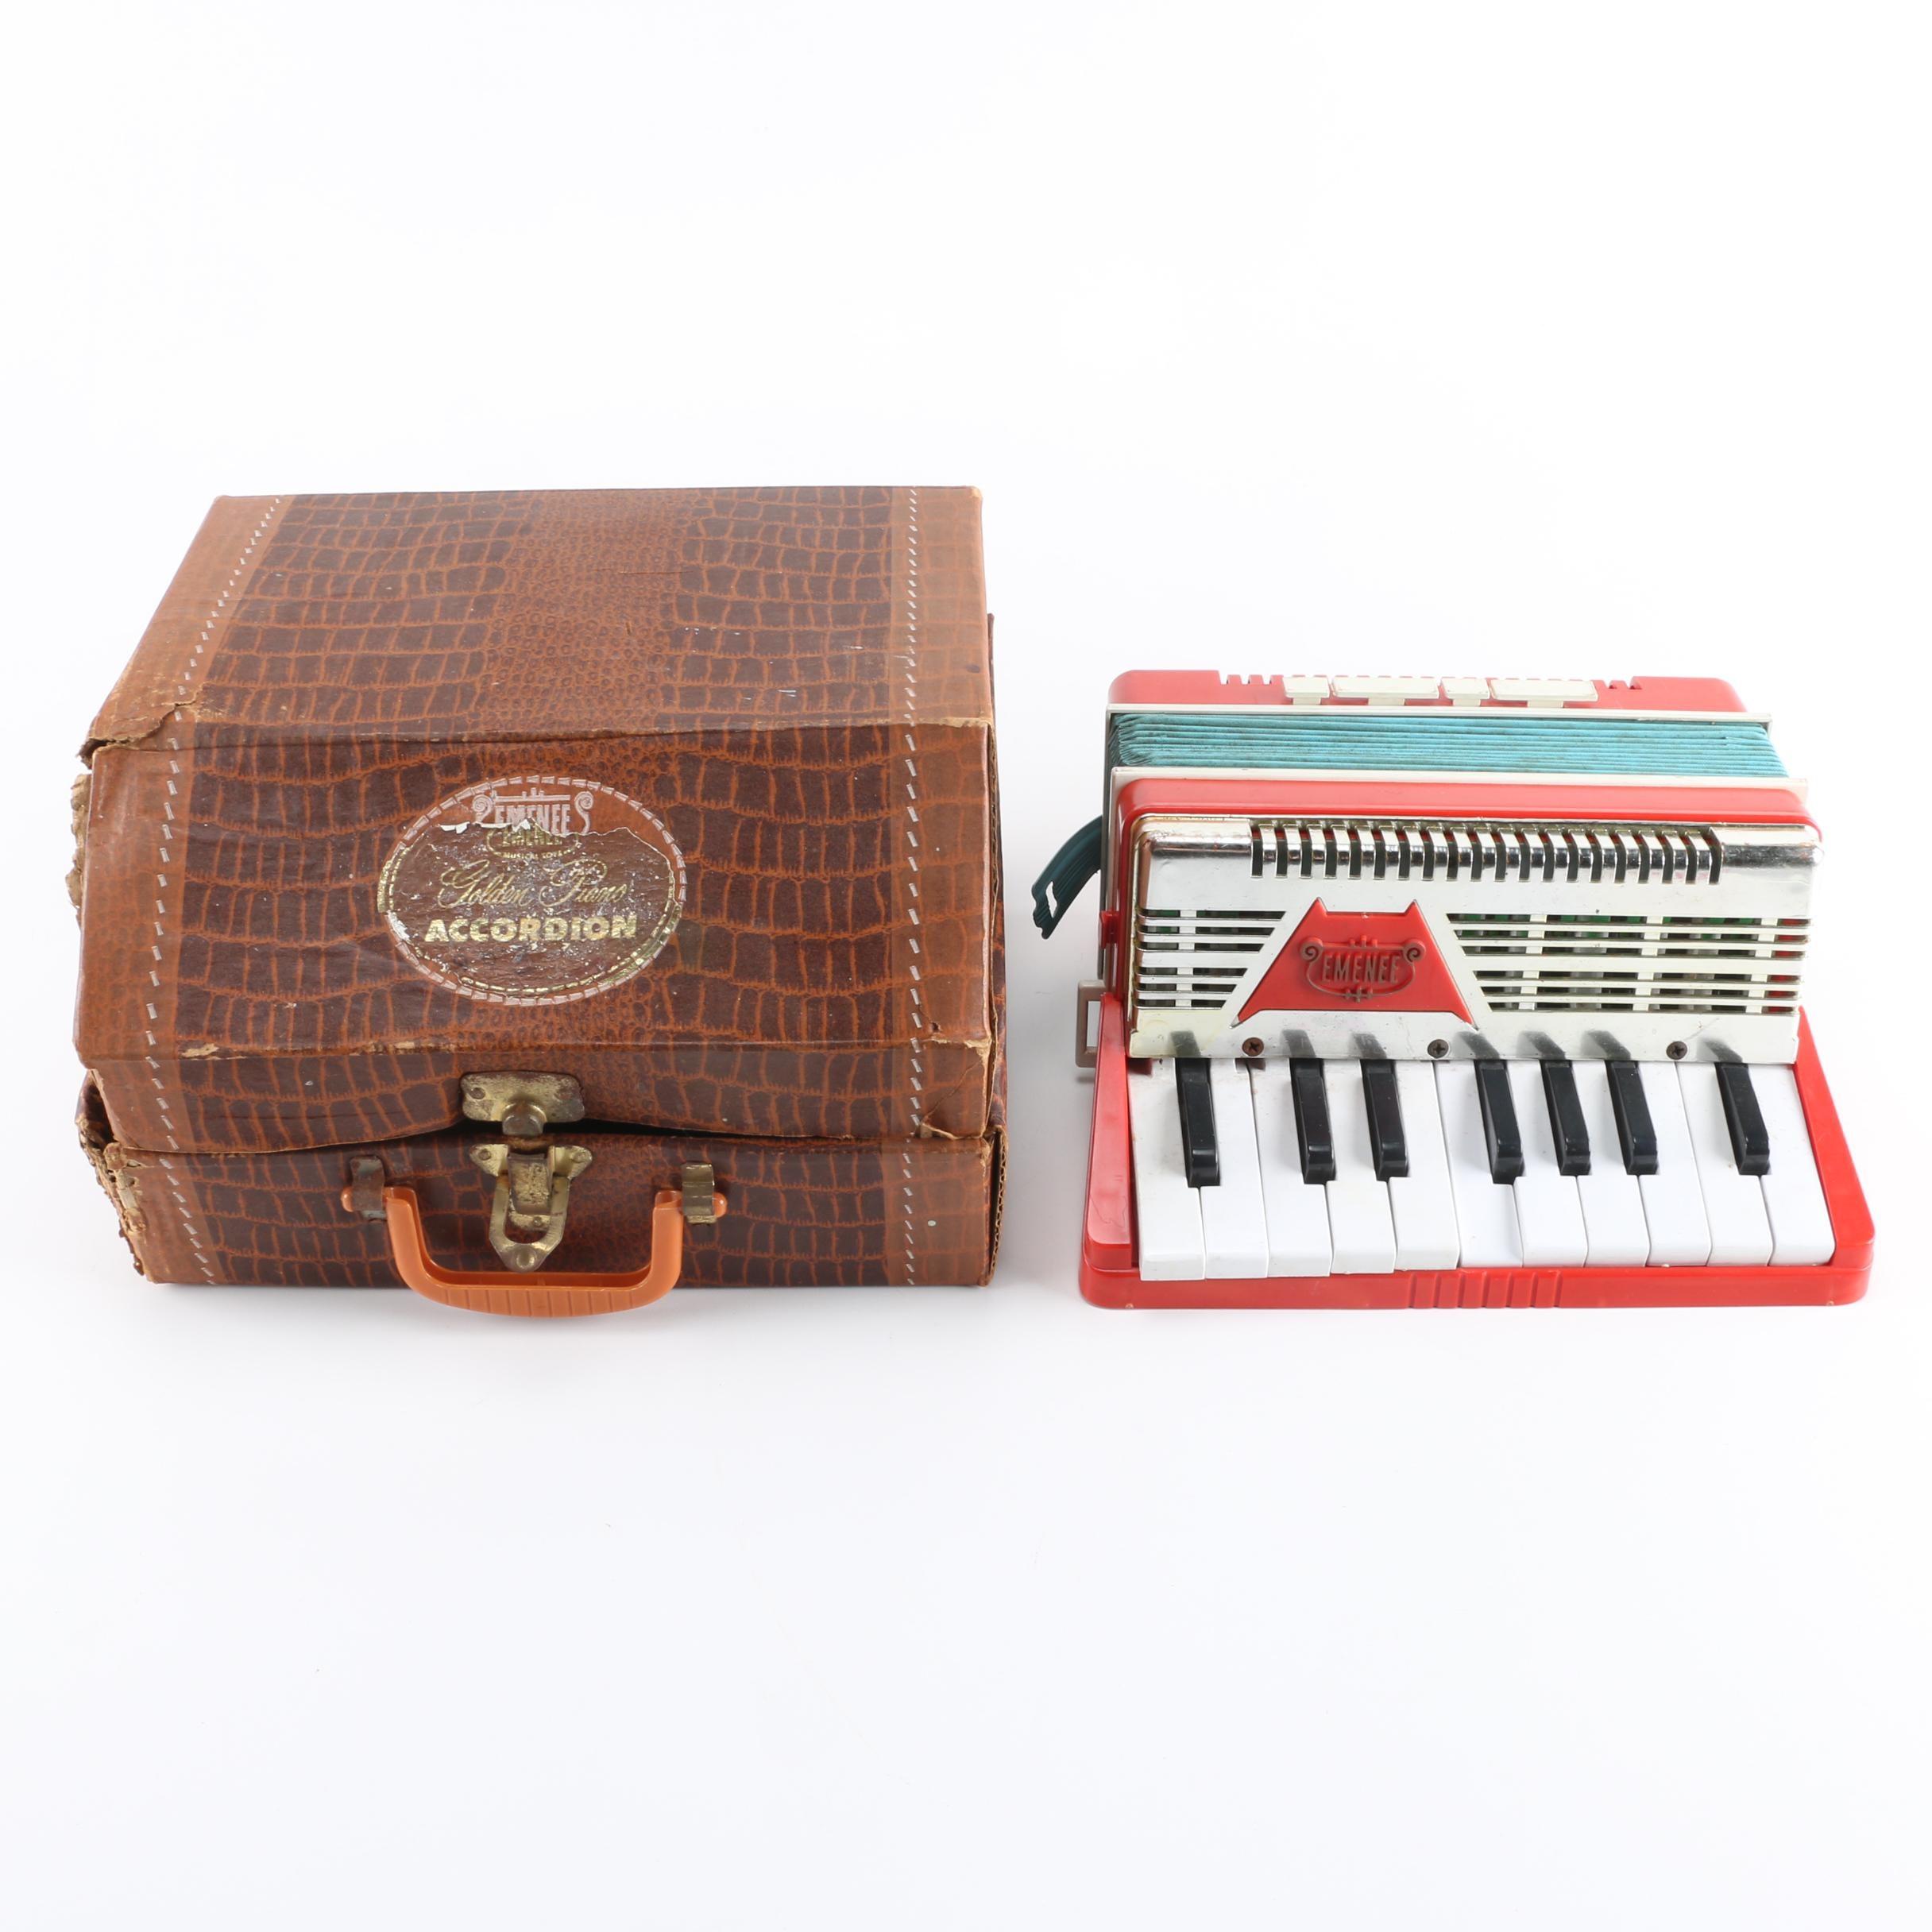 Circa 1950s Emenee Child's Golden Piano Accordion